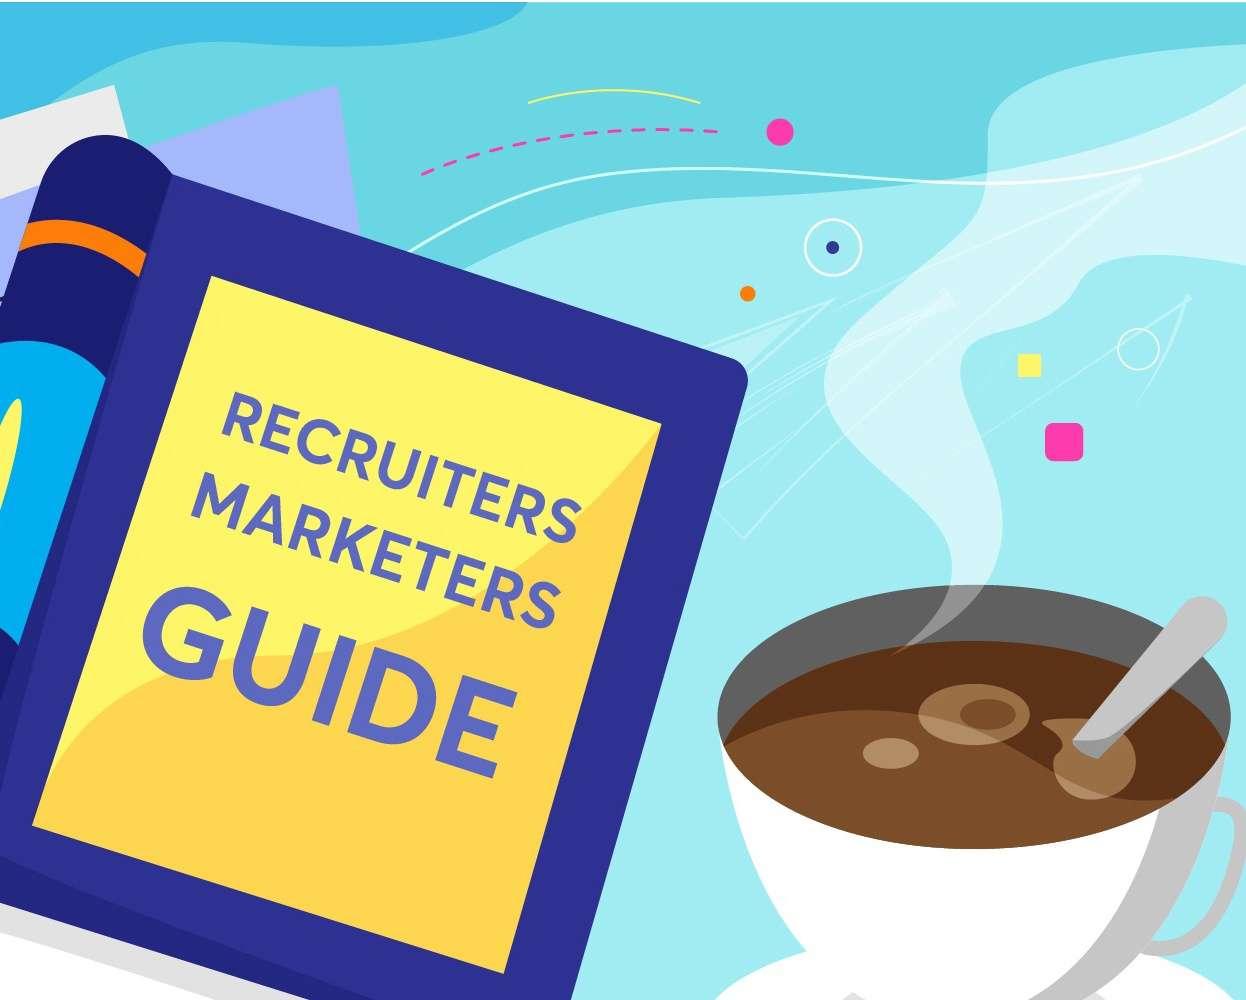 Smartdreamers Recruitment Marketing